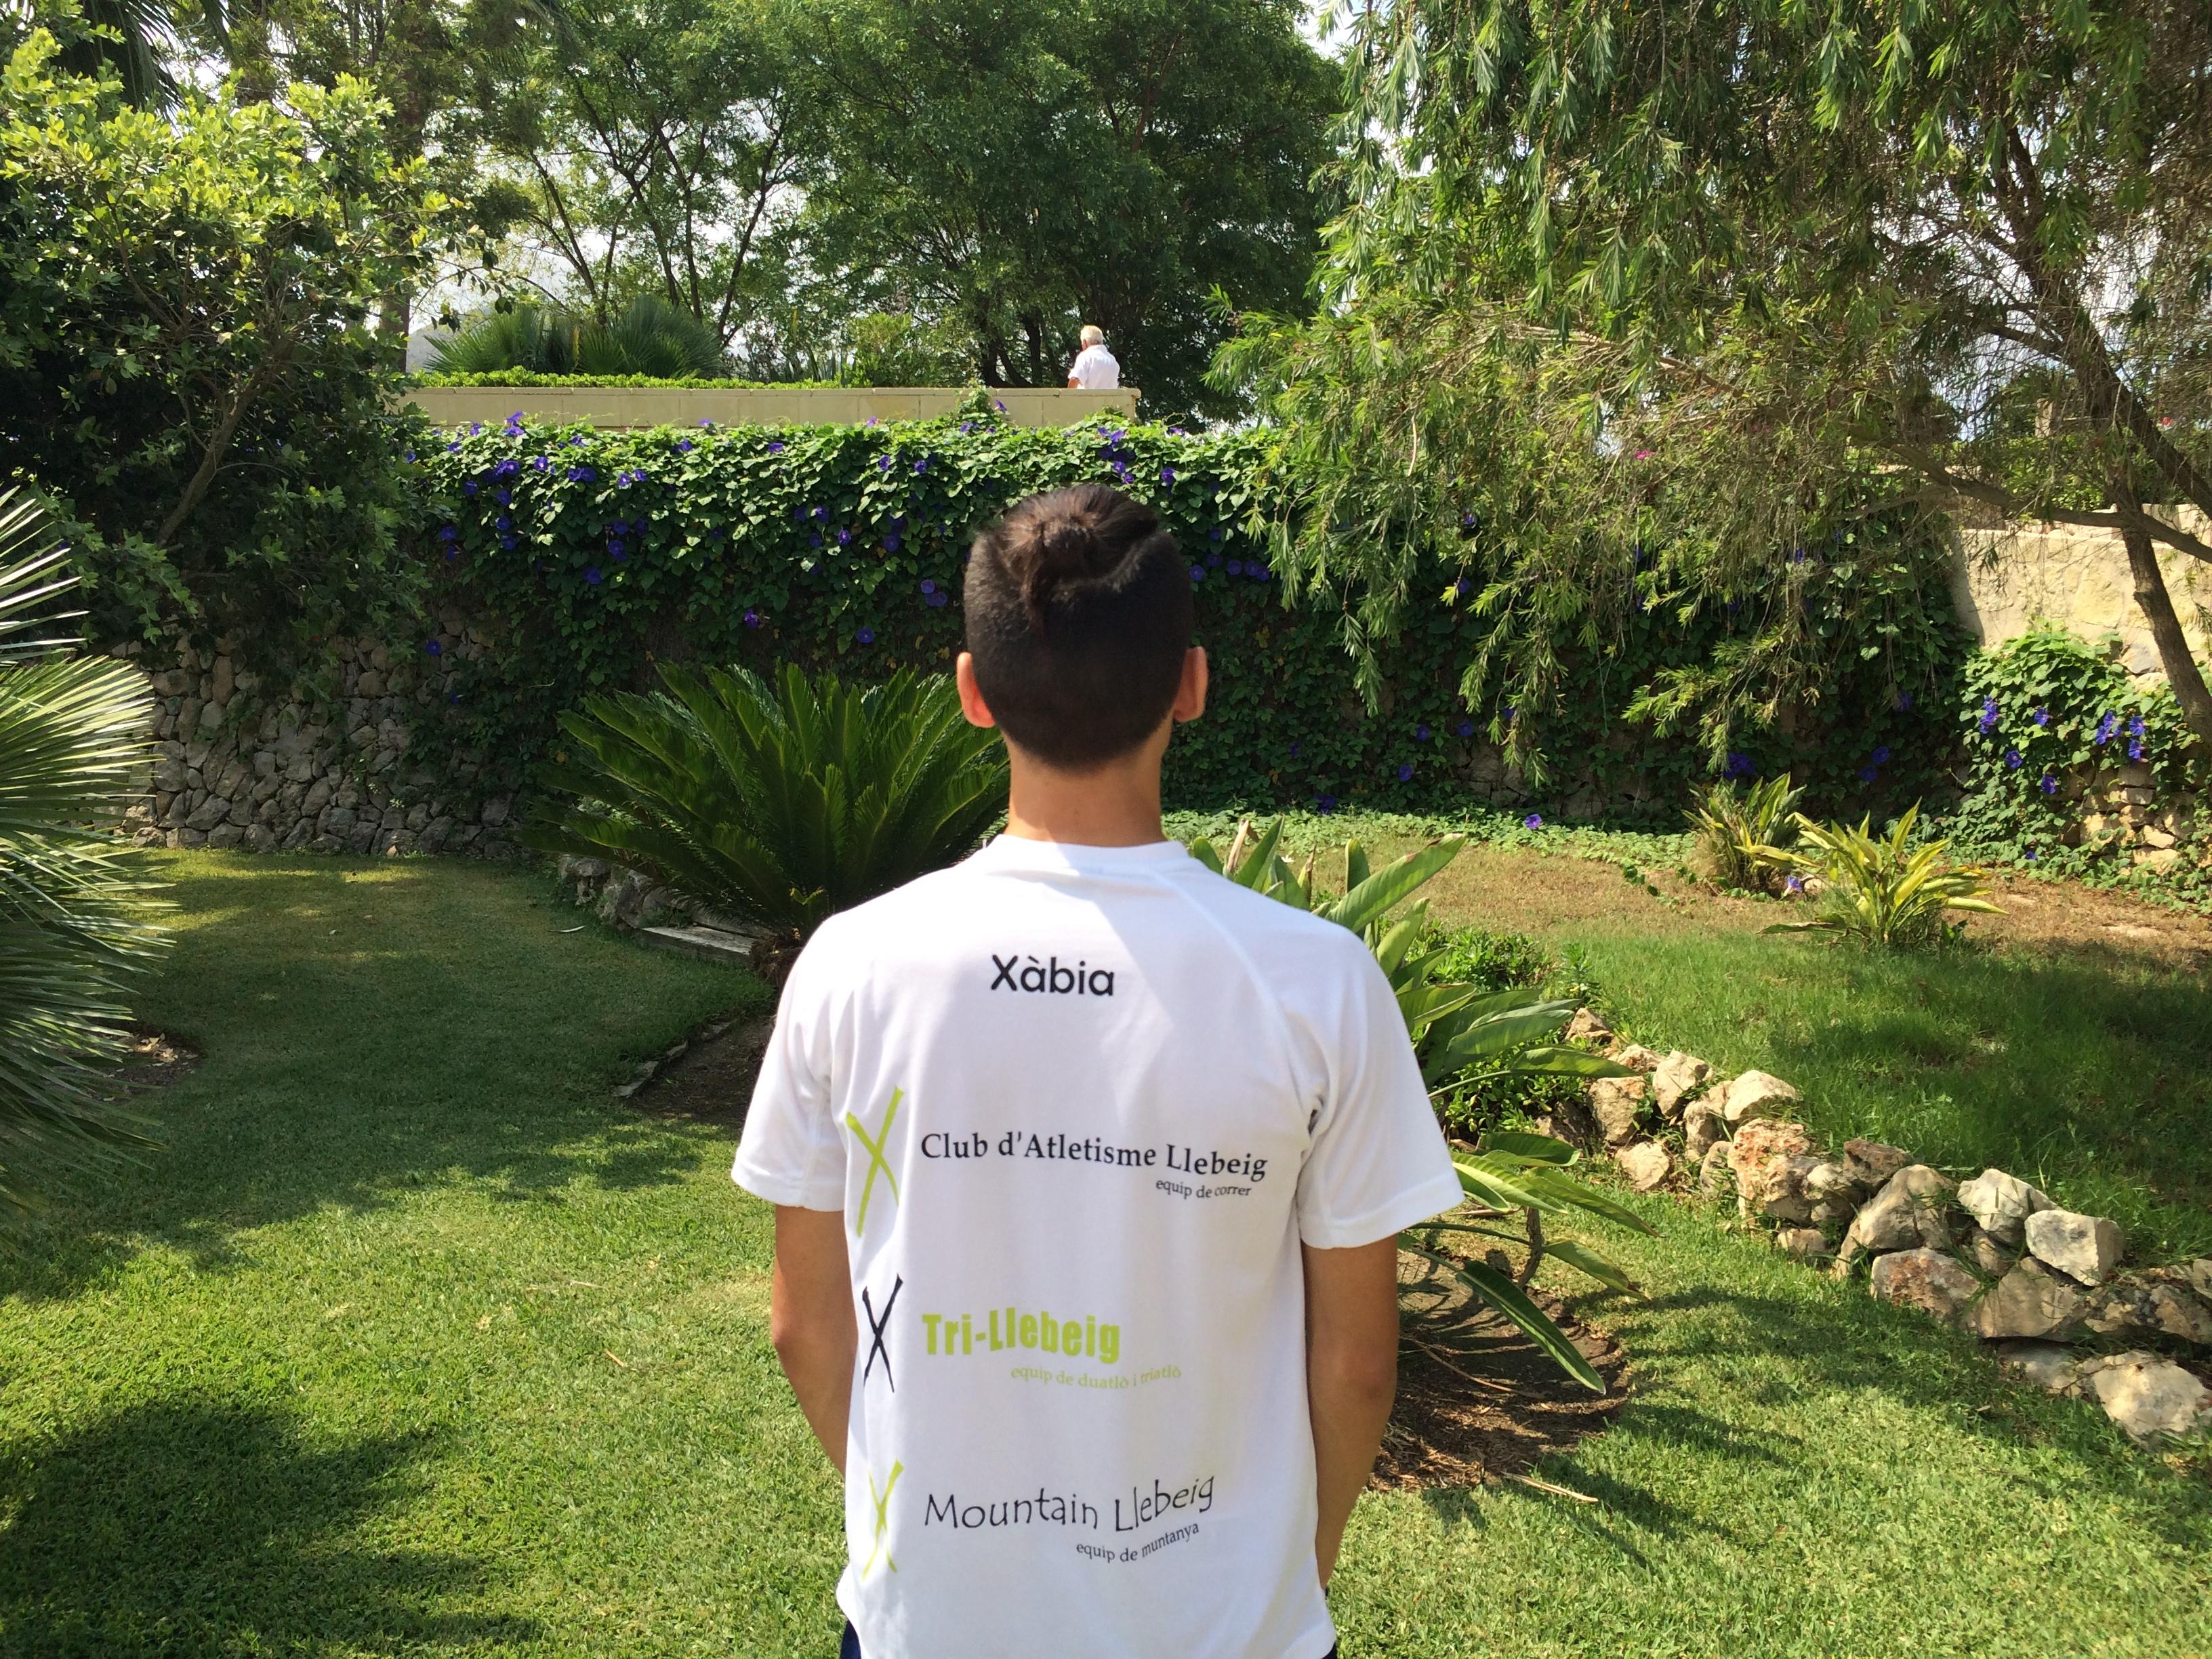 """Siro Piña Cardona"" de Jávea/Xàbia representa a España en el Mundial de atletismo en Cali (Colombia), Mario Schumacher Blog"